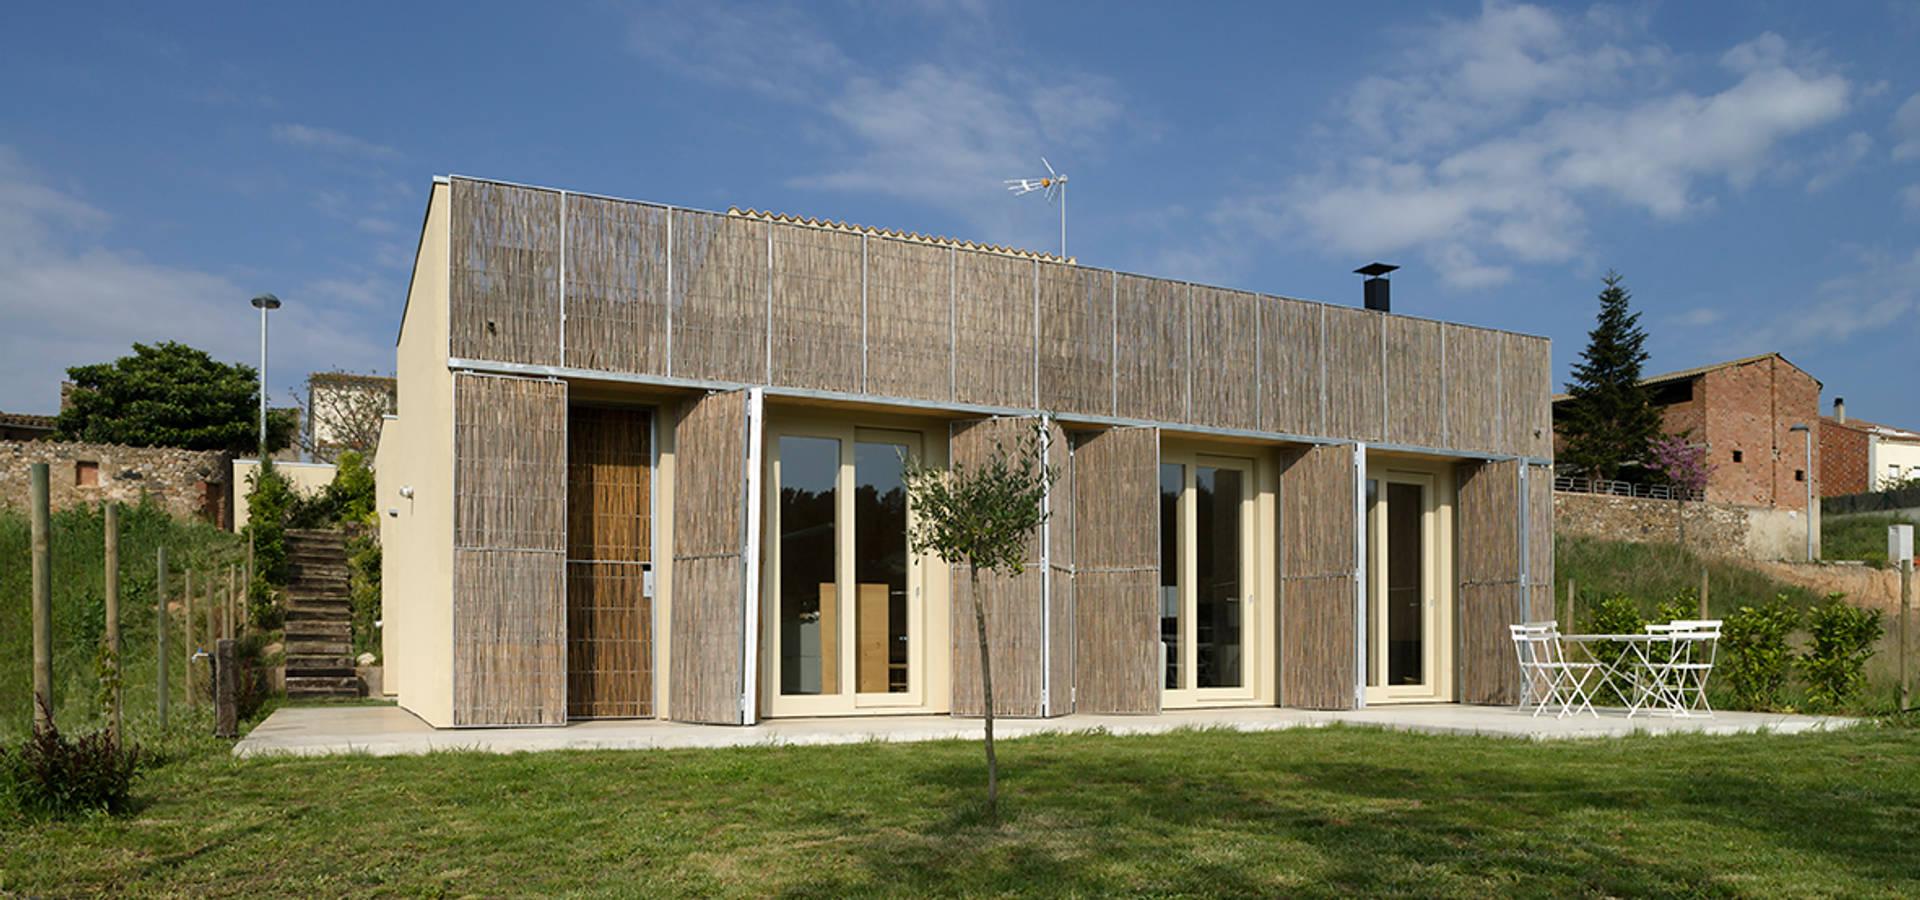 B house arquitectos en barcelona homify for B house